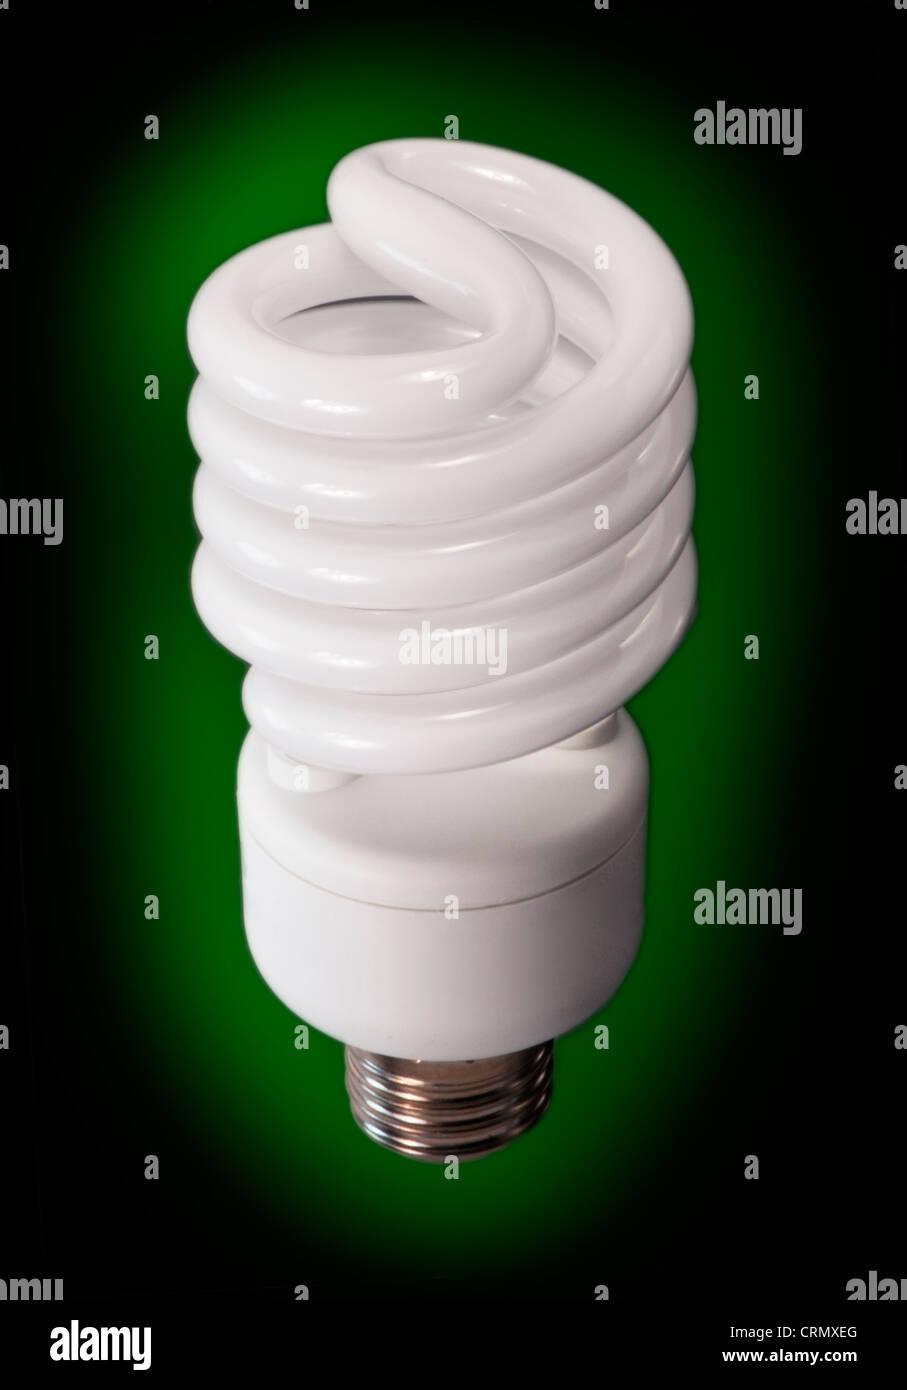 compact fluorescent light bulb - Stock Image